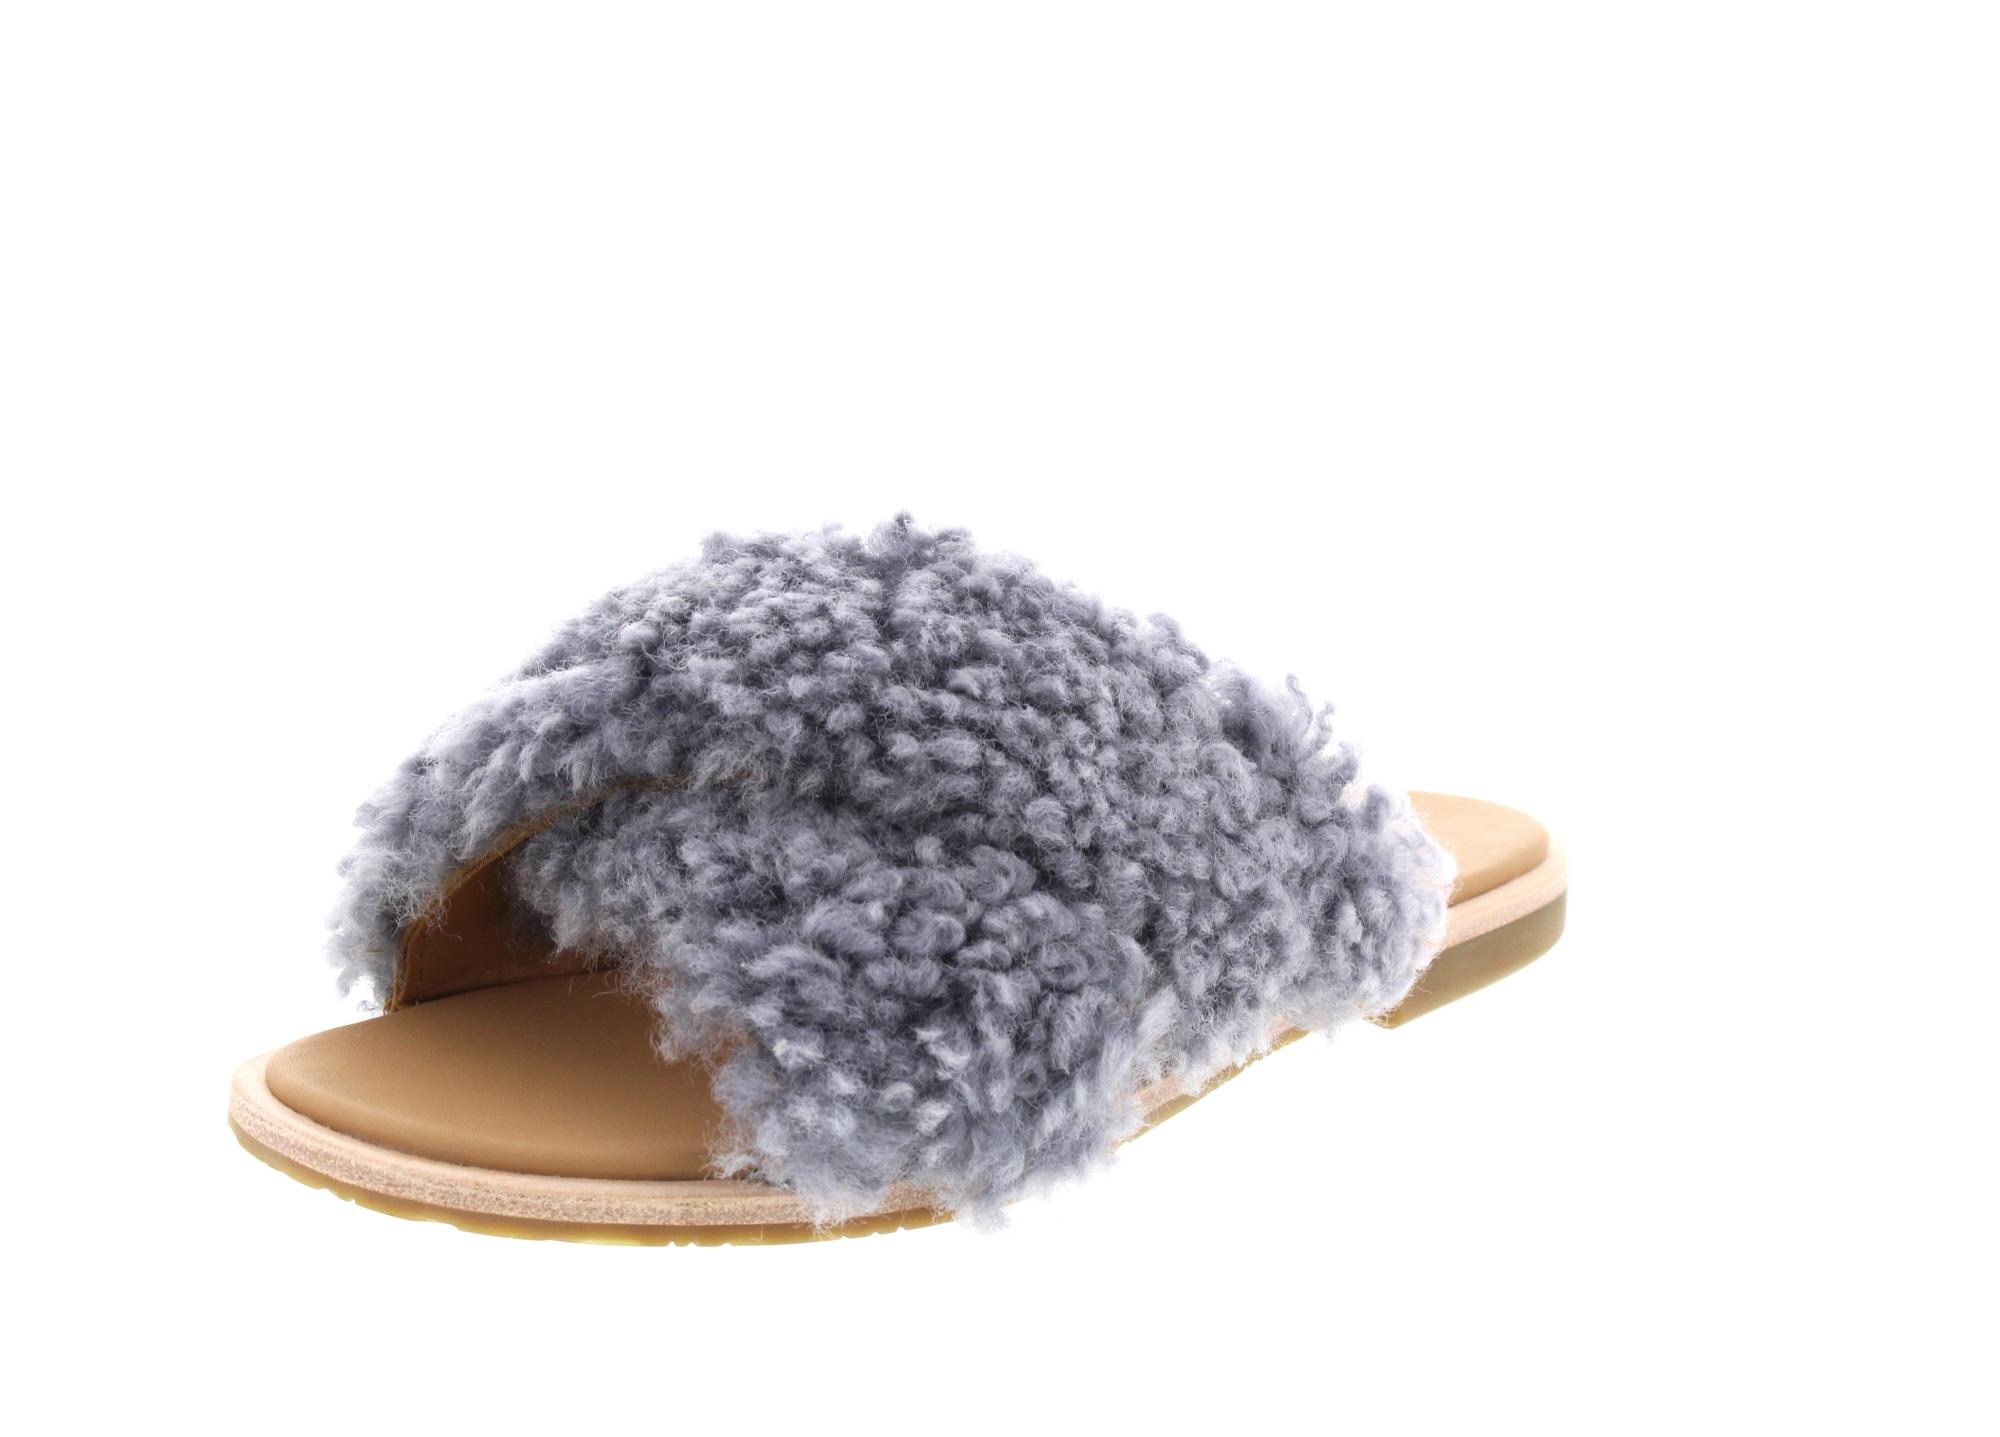 UGG Damenschuhe - Pantolette JONI 1092989 - lude grey_0